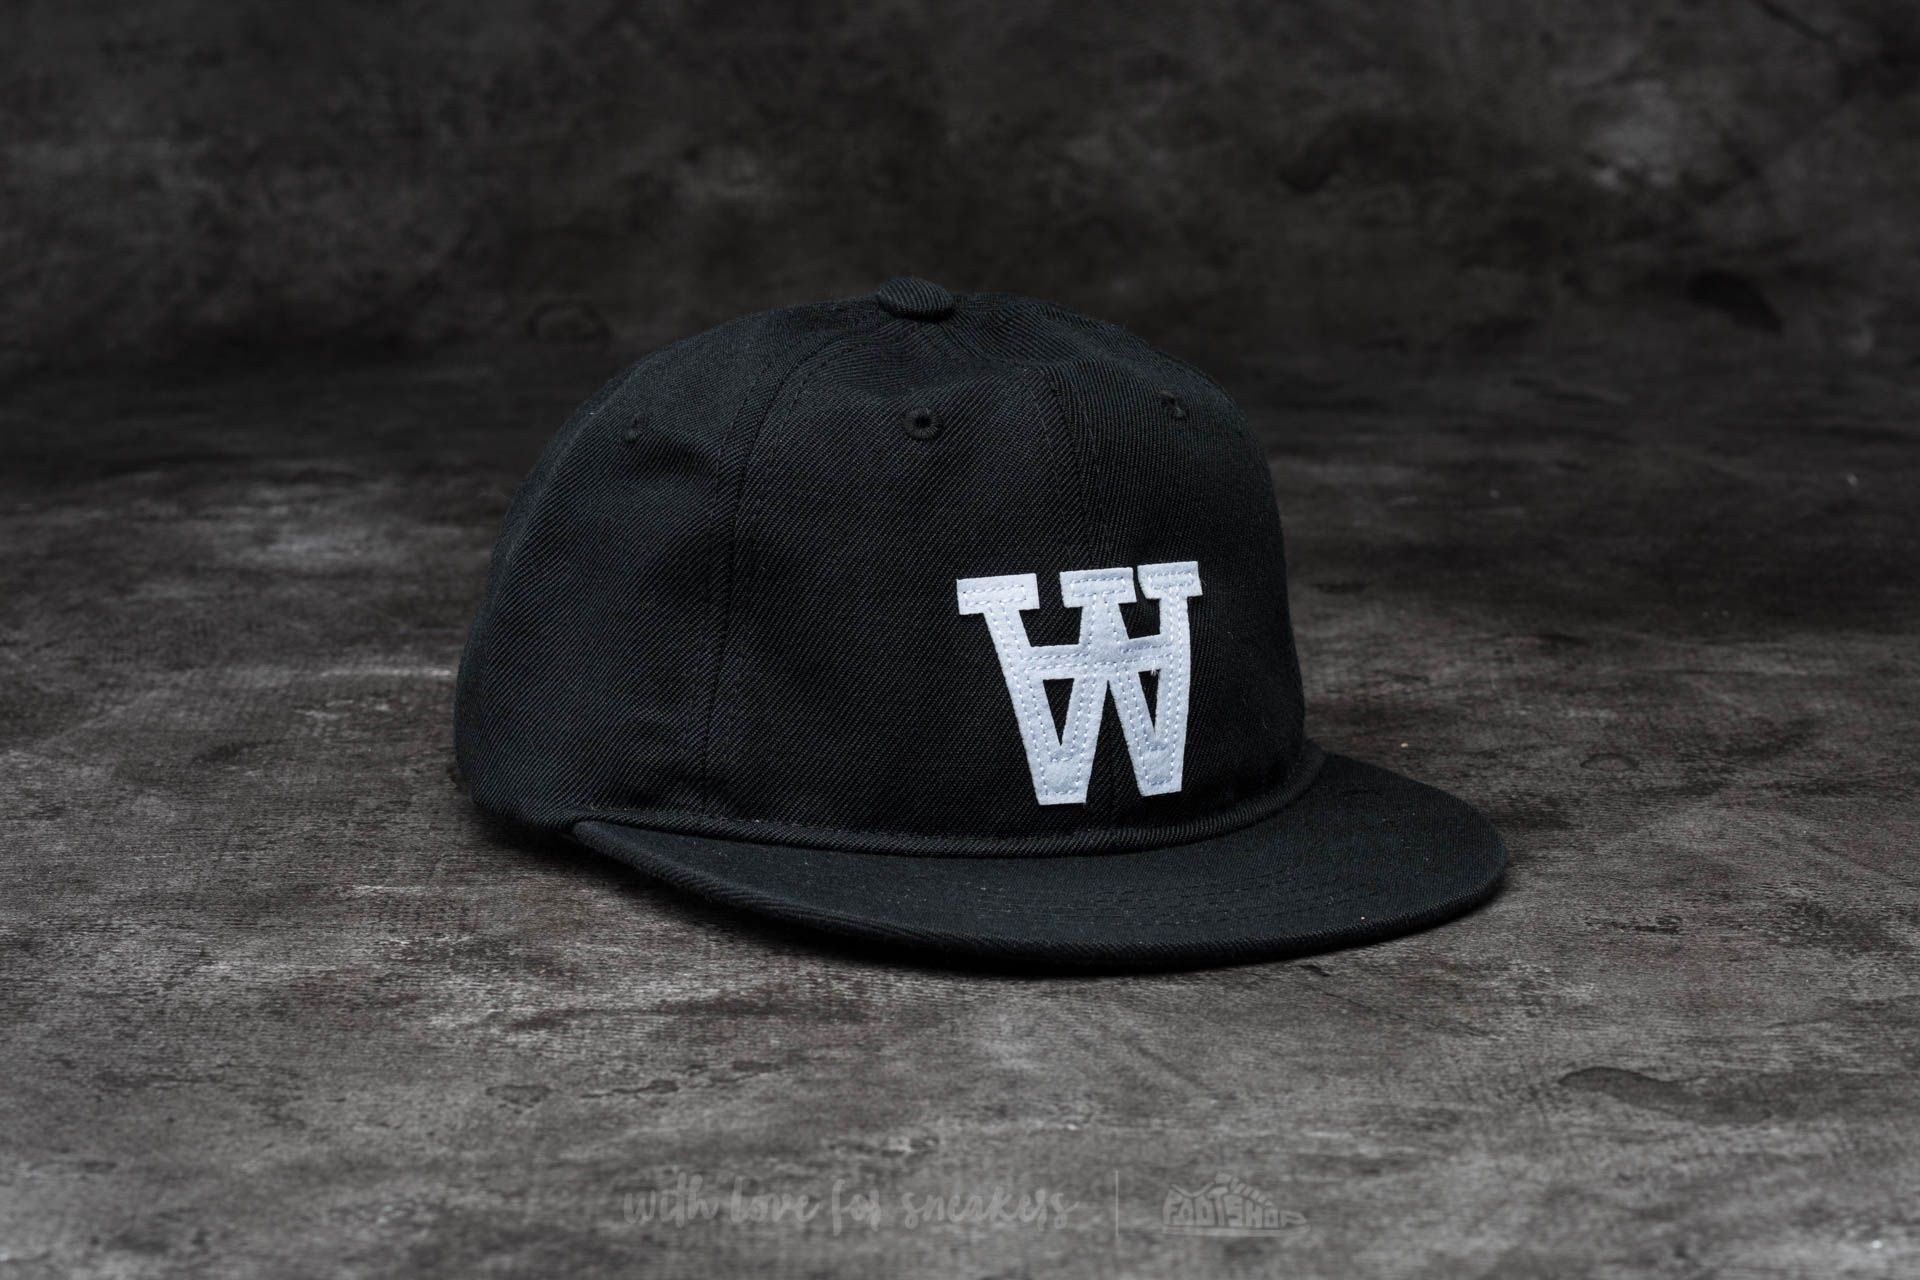 e61a38898c2 WOOD WOOD Baseball Cap Black